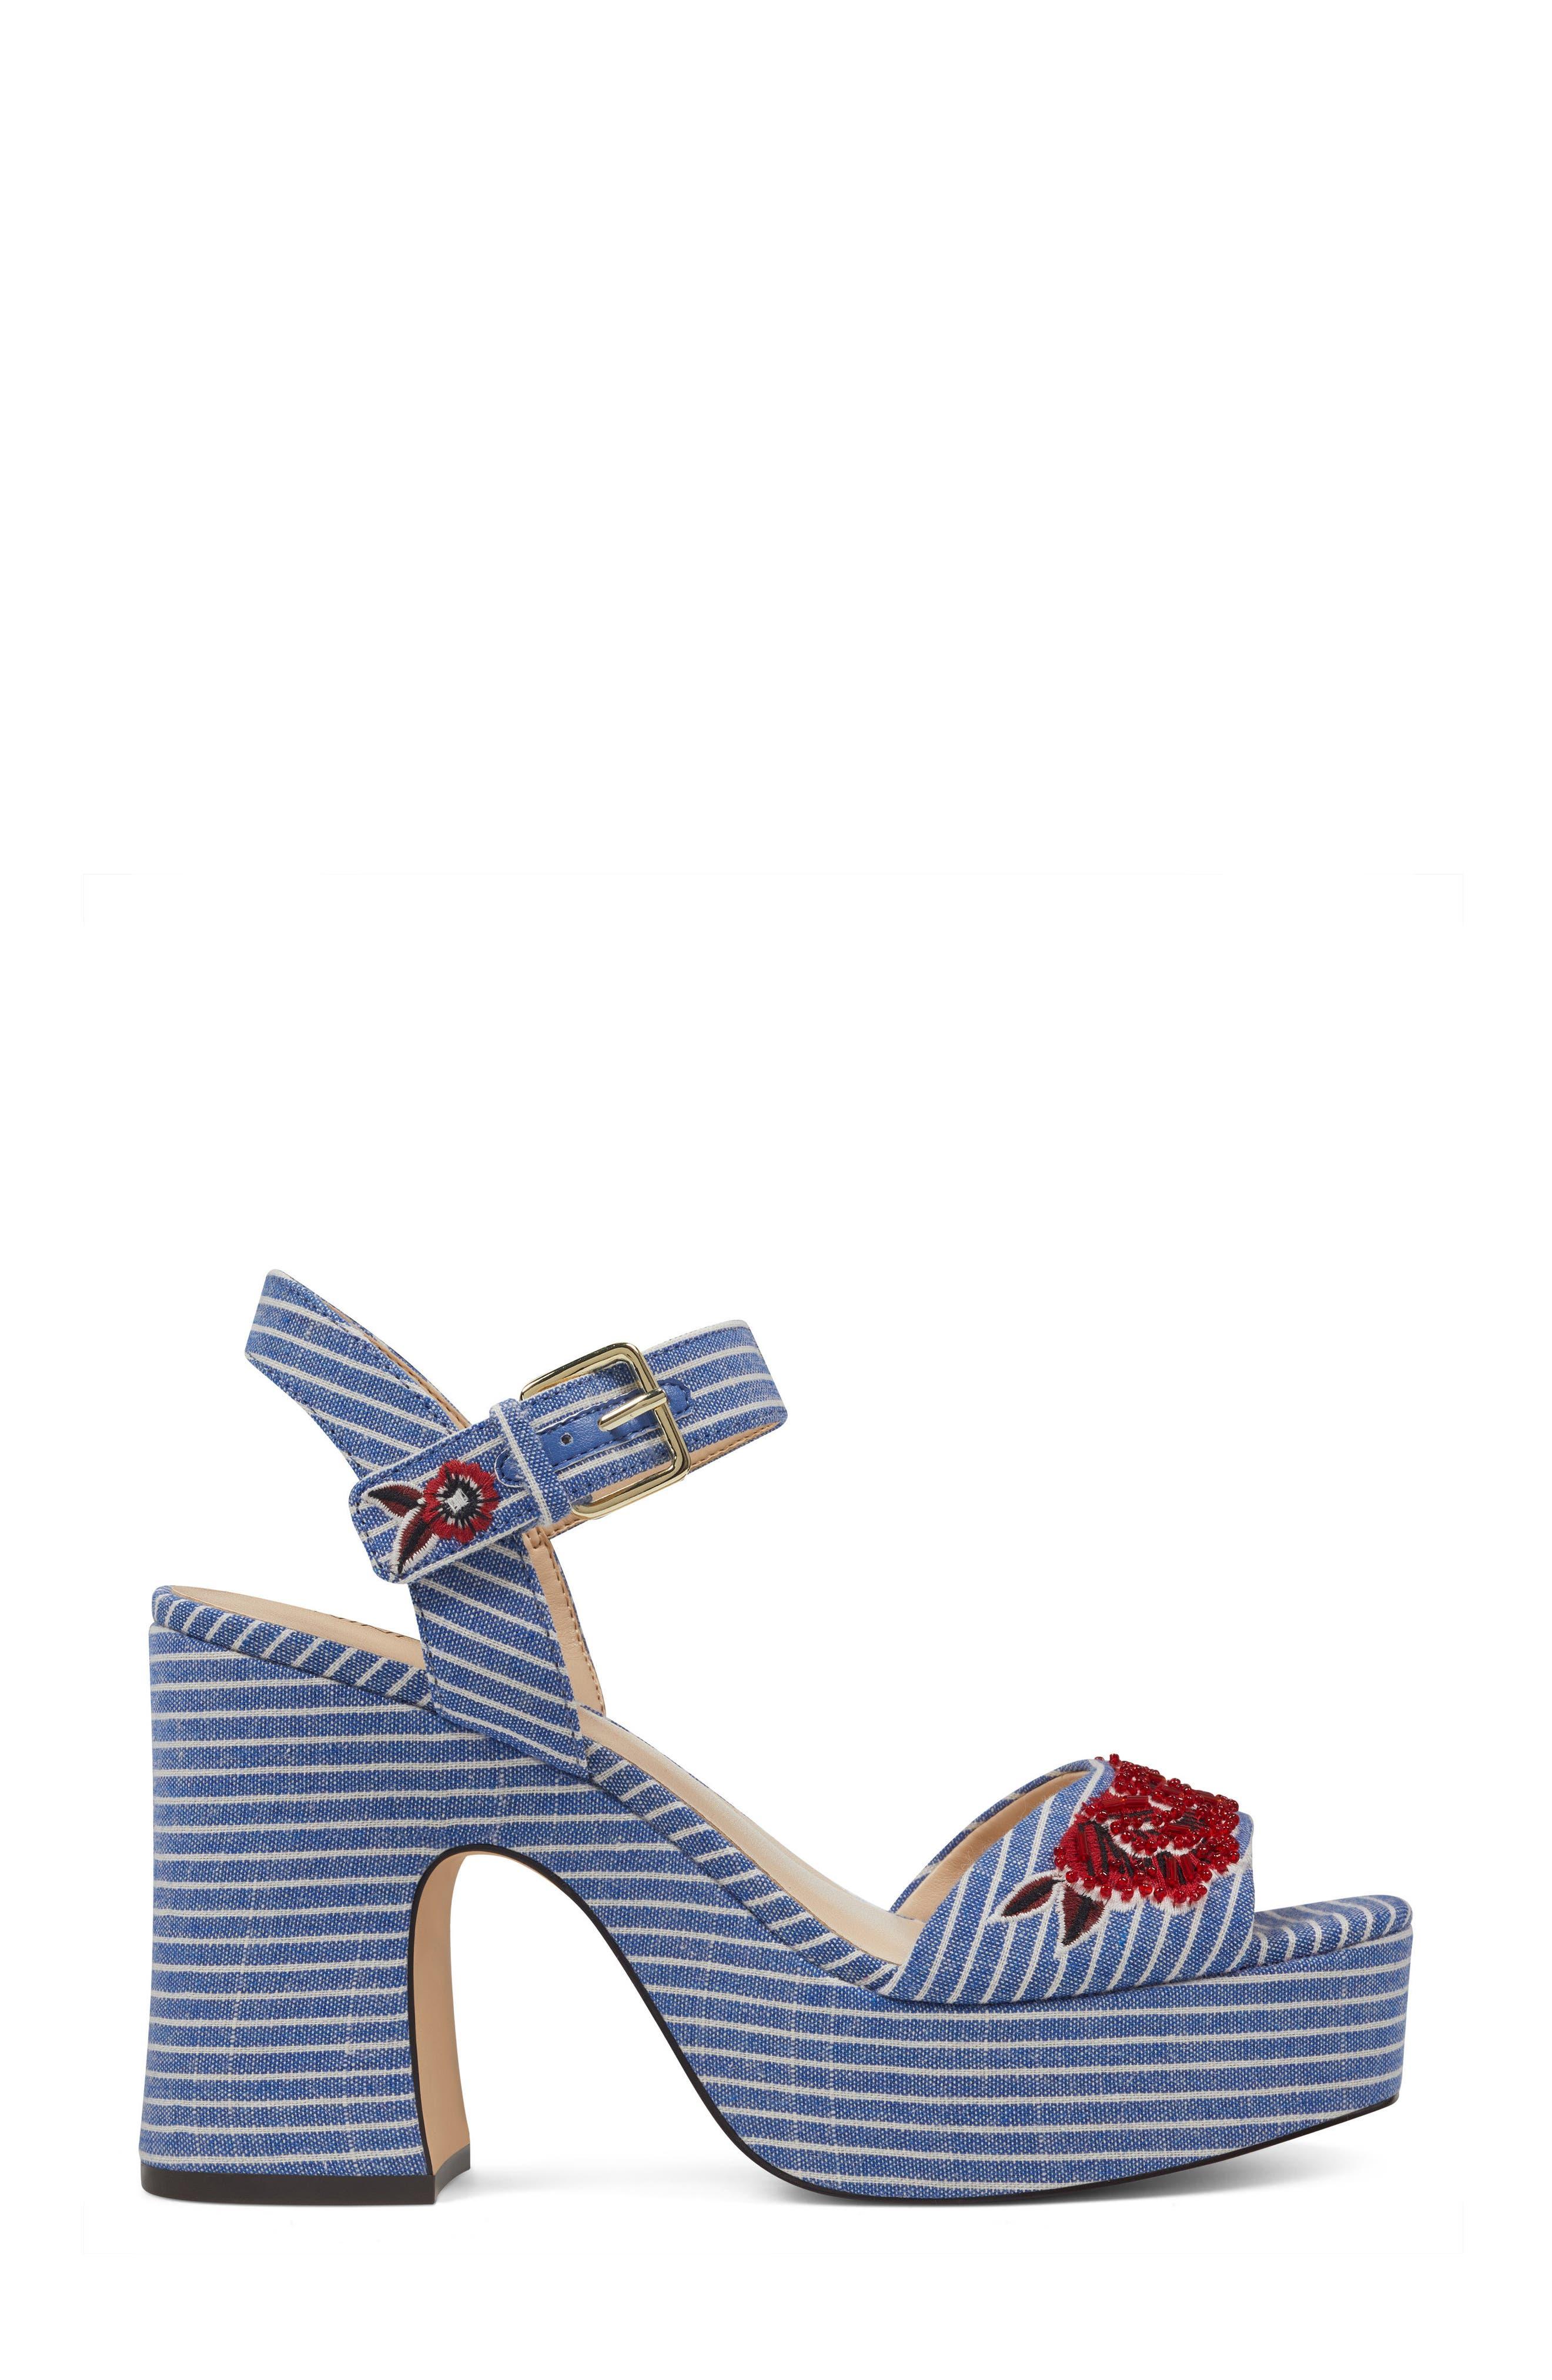 Fontayah Platform Sandal,                             Alternate thumbnail 3, color,                             Blue/ White Fabric